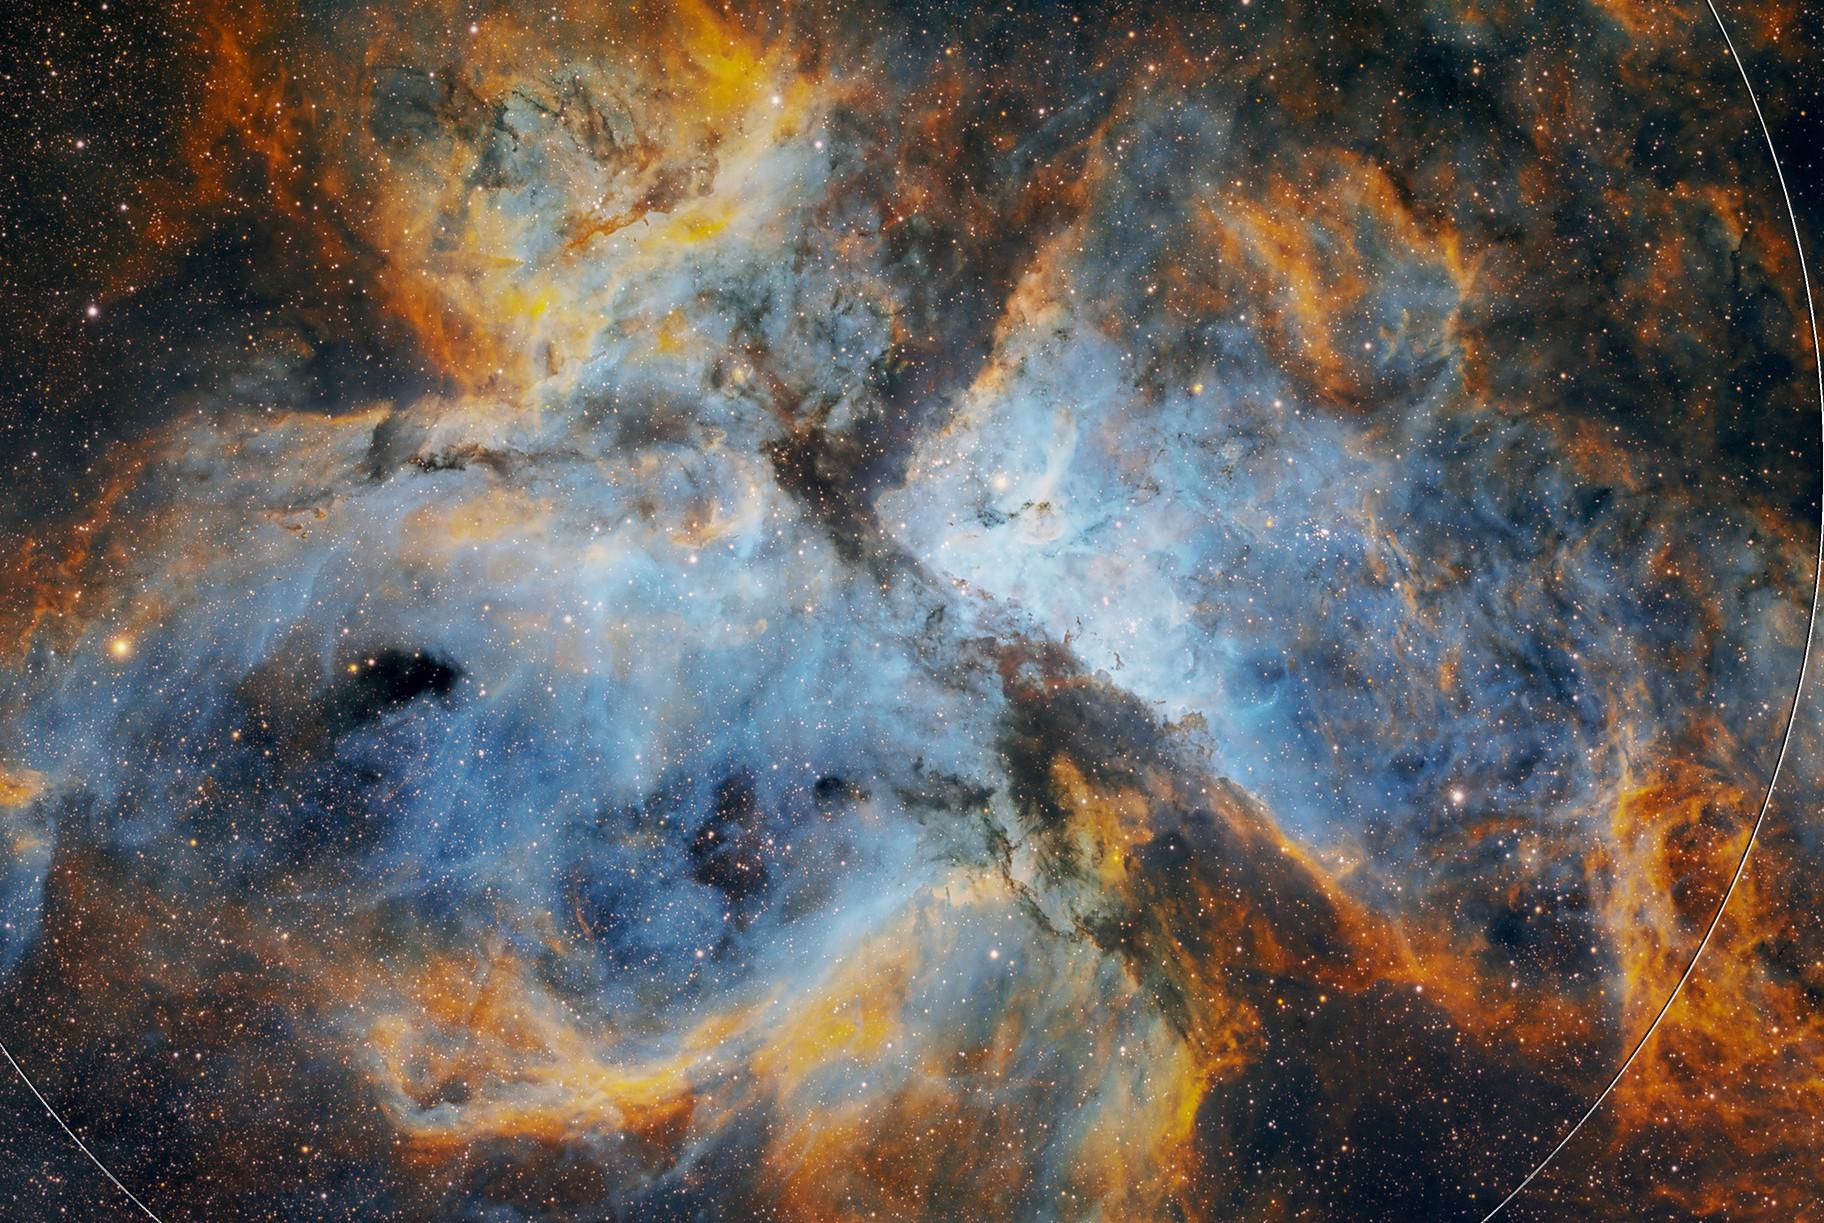 Carina Nebula in SHO - my first mono camera image ASI294mm